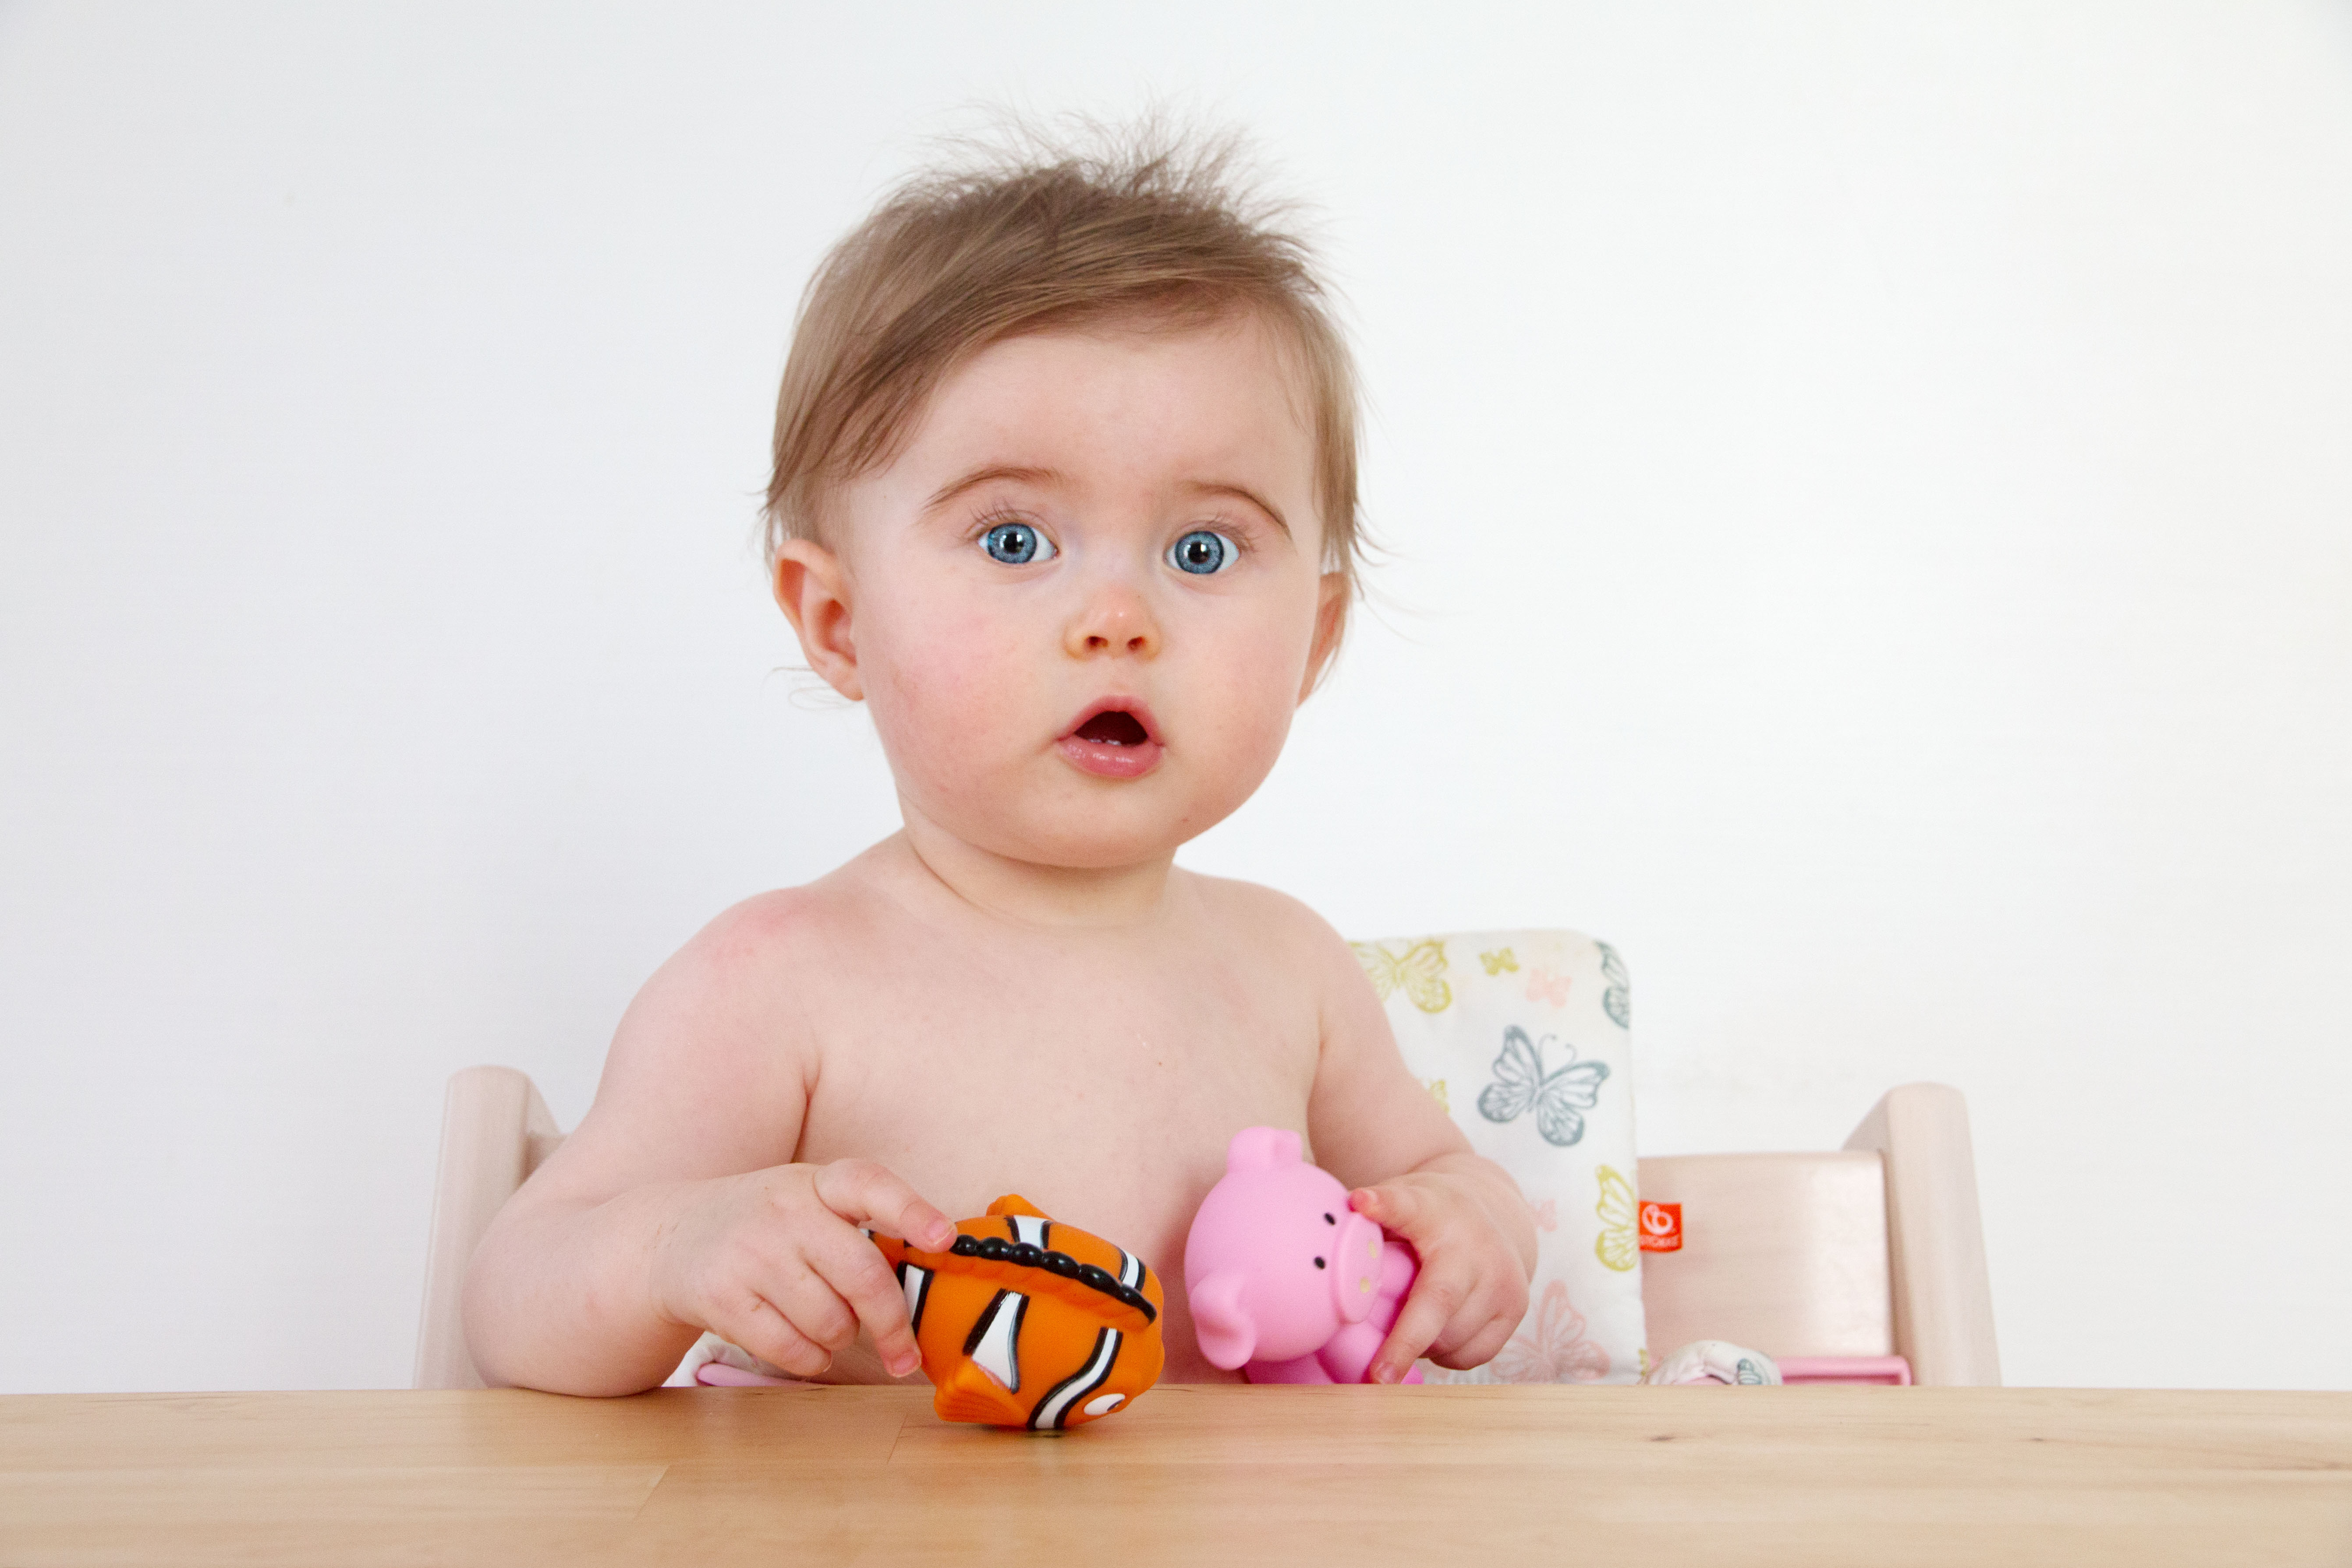 Photographe naissance lorraine nancy